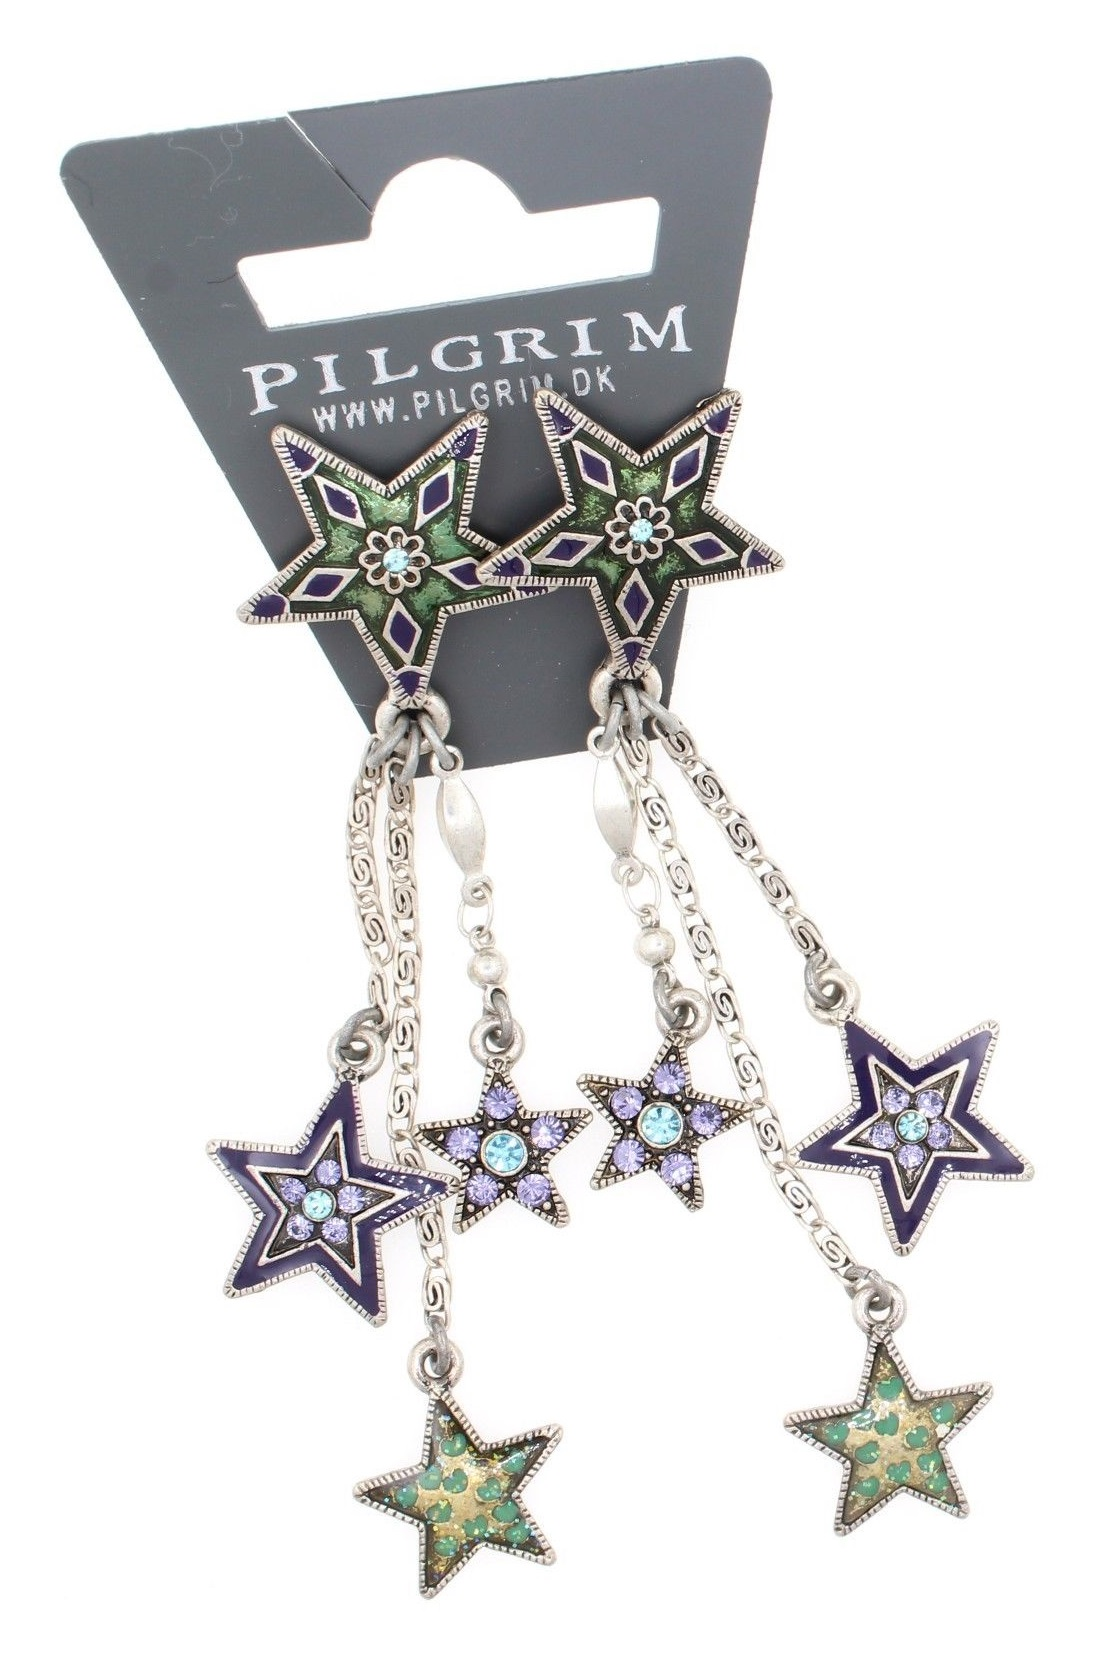 PILGRIM - STARS - Cascade Earrings - Silver Plate/Blue & Purple Swarovski BNWT